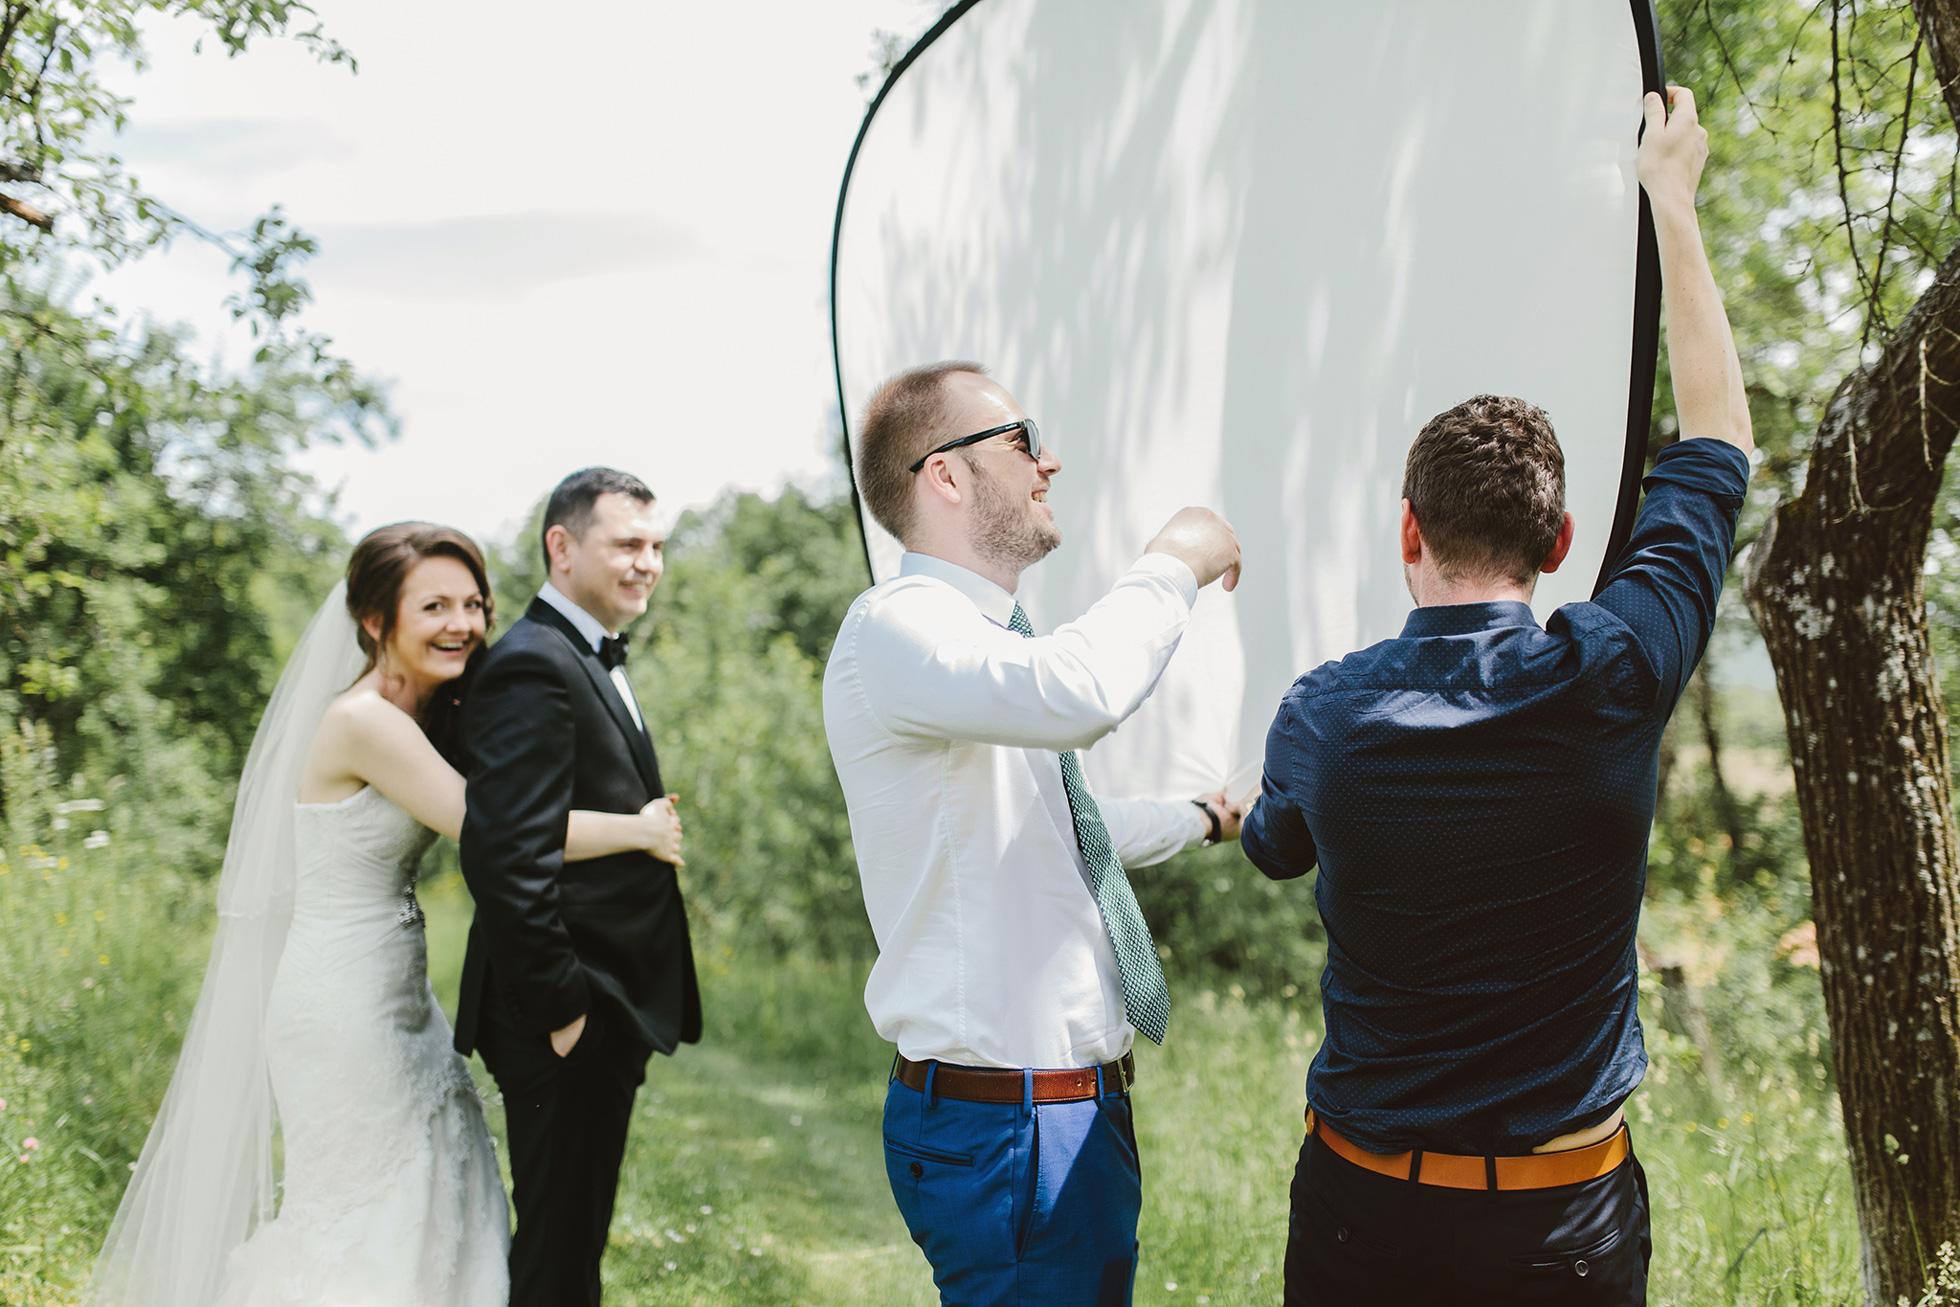 Liana-+-Florin-{wedding}-104